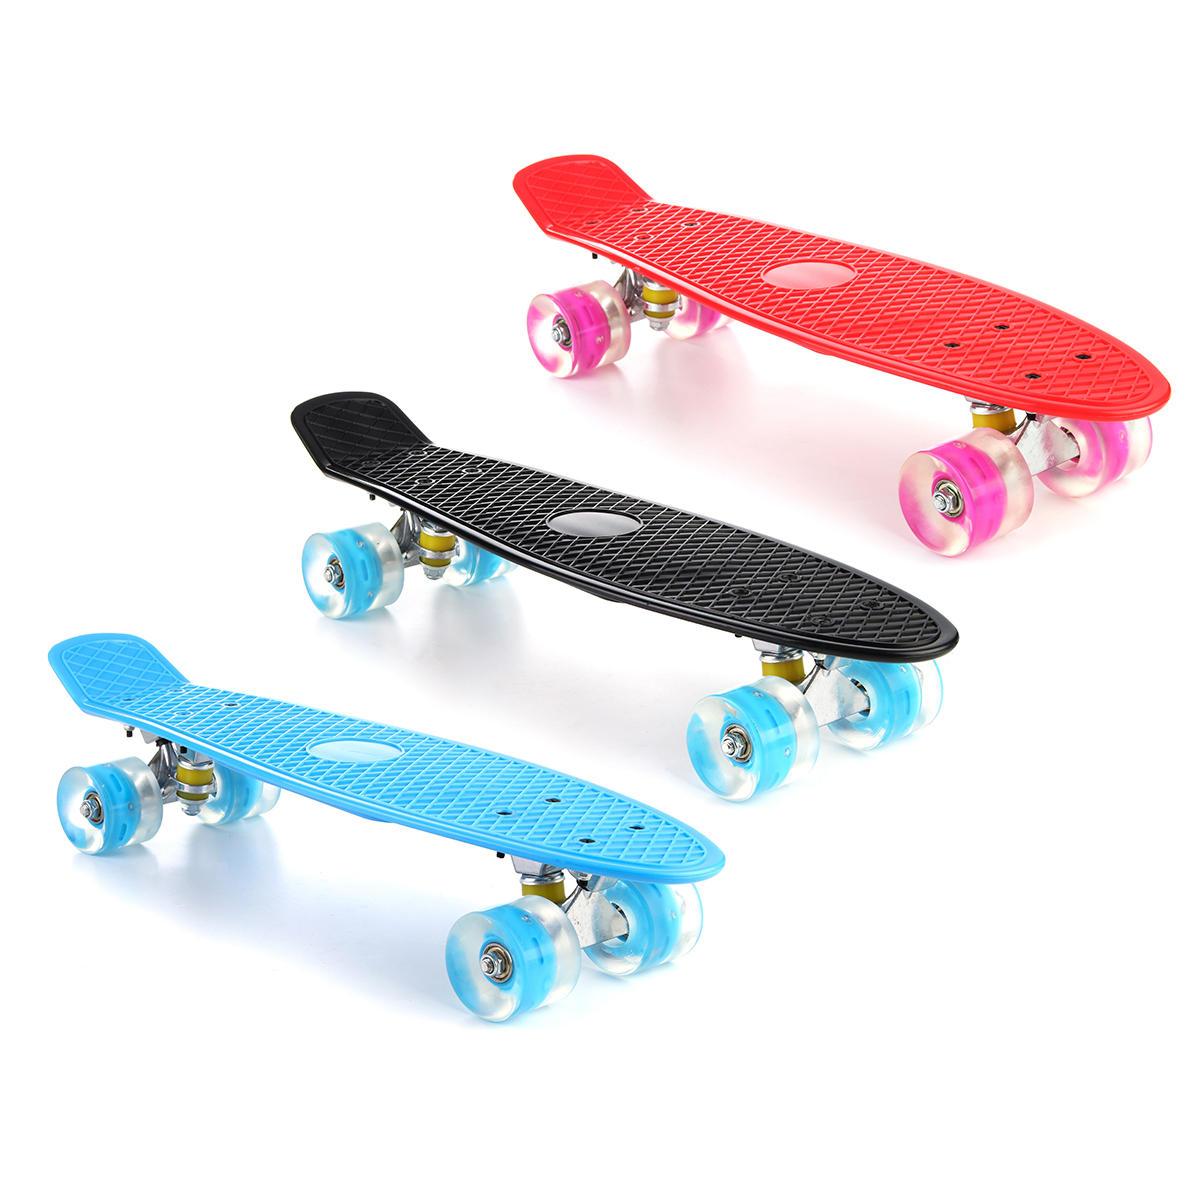 22'' LED Light Up Fish Skateboard 4 PU Wheel Single Warping Board Teenagers Kids Skateboard